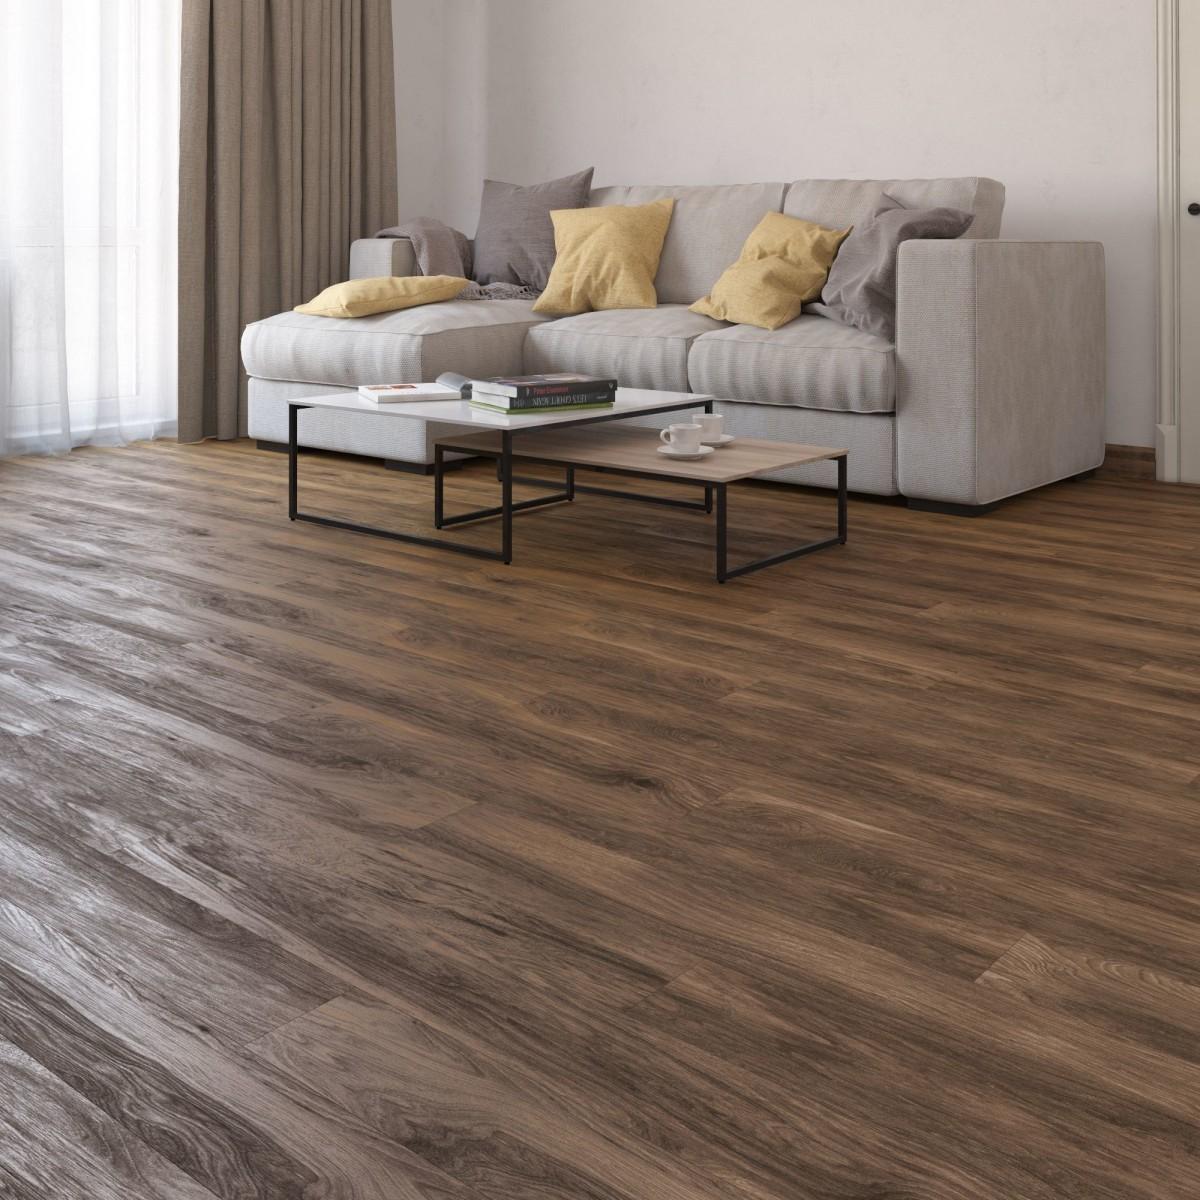 Ламинат Artens Дуб вилен 32 класс толщина 8 мм 2.131 м²